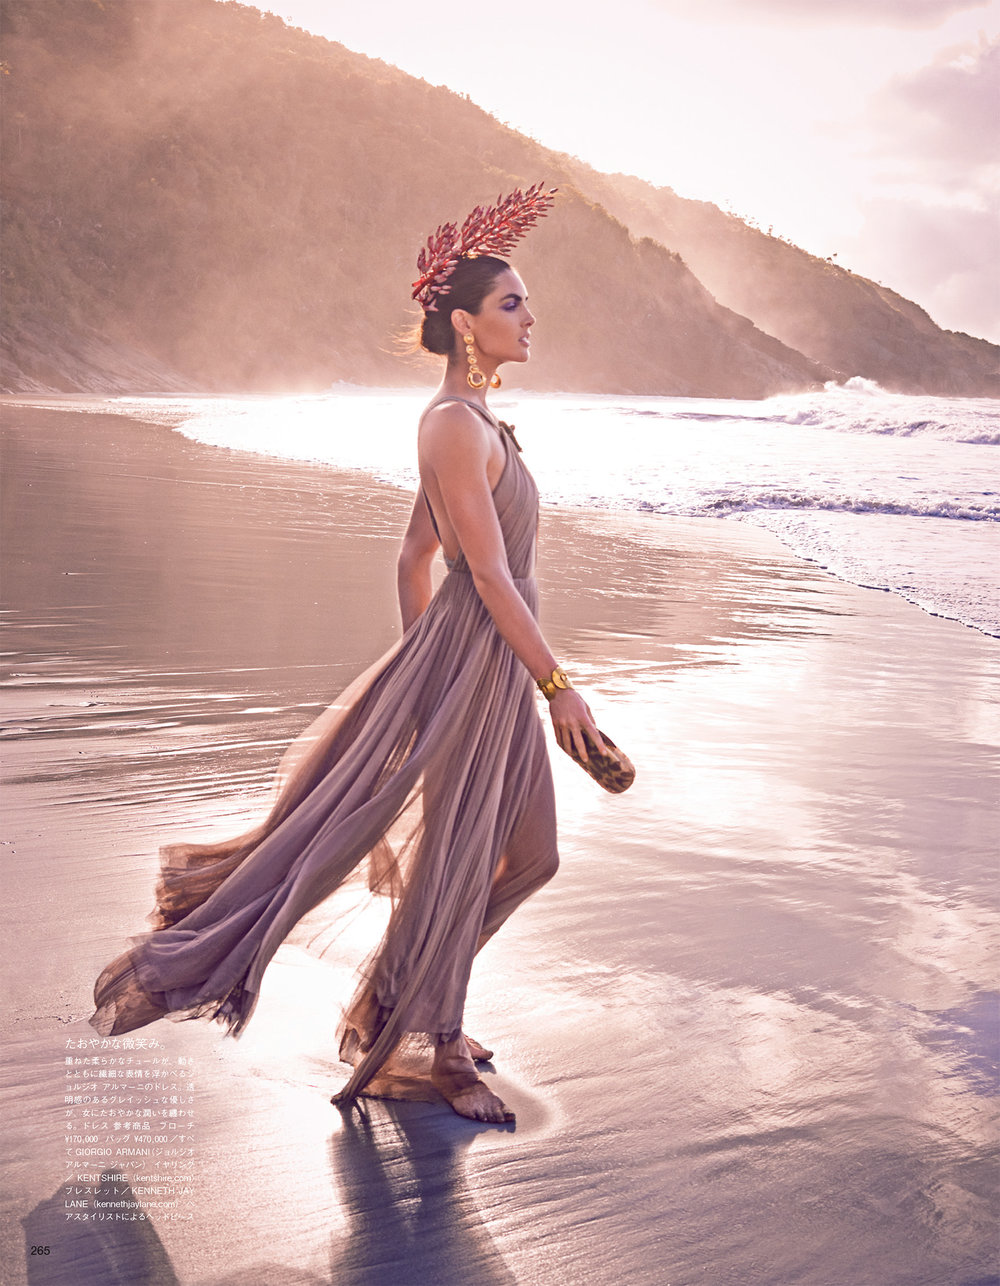 Giovanna-Battaglia-Vogue-Japan-Mariano-Vivanco-Forbidden-Paradise-7.jpg